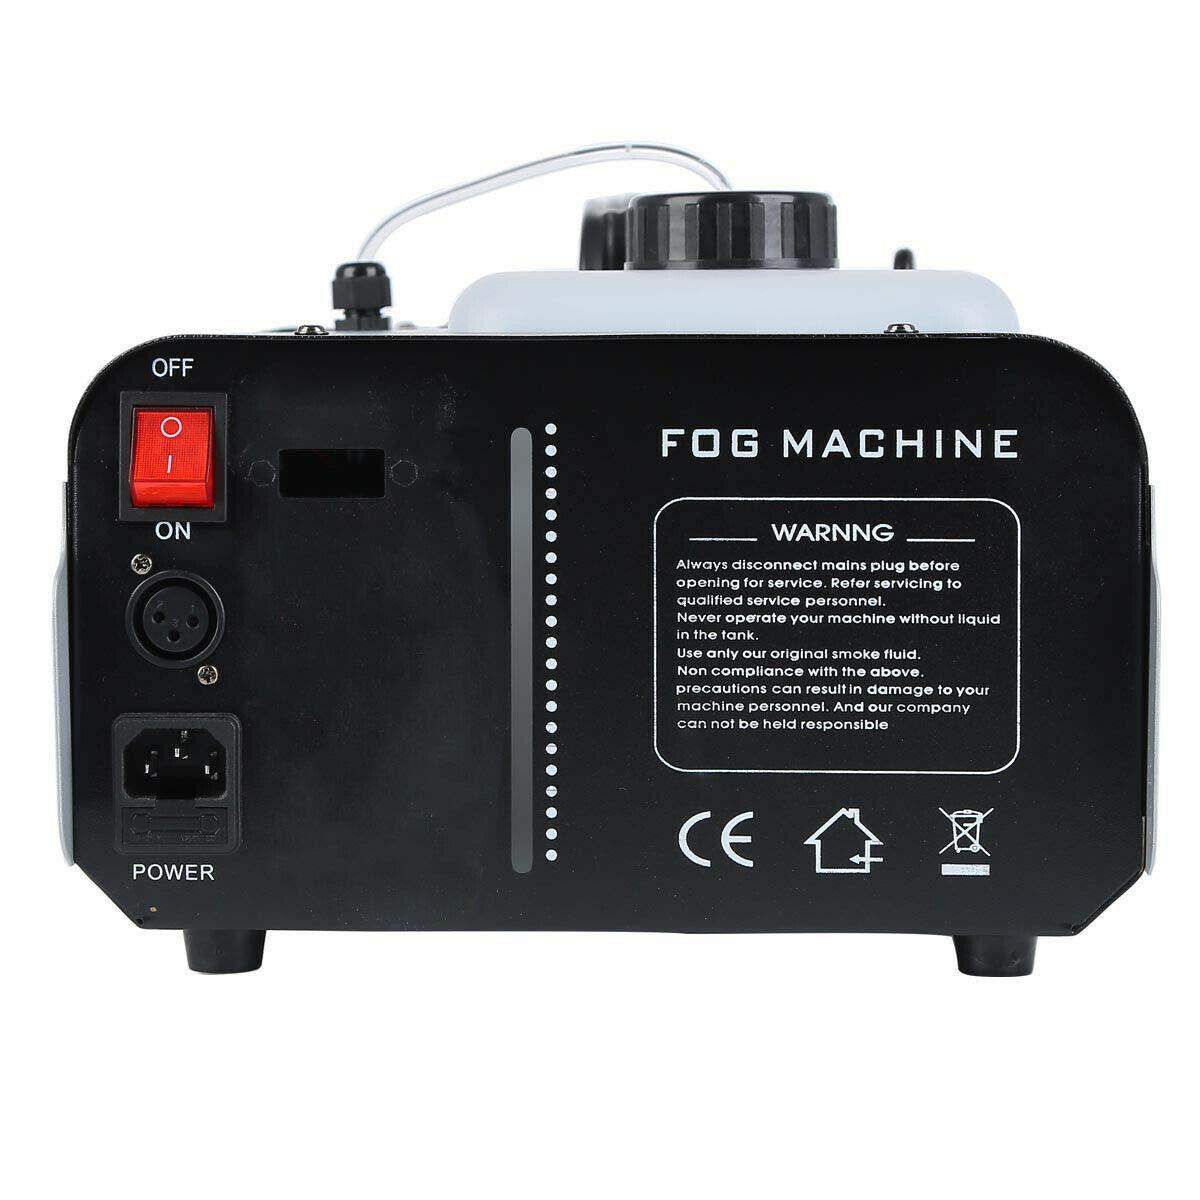 Tengchang 1500 Watt Smoke Fog Machine 9 LED Lights Remote Control Halloween DJ Party Stage Fogger